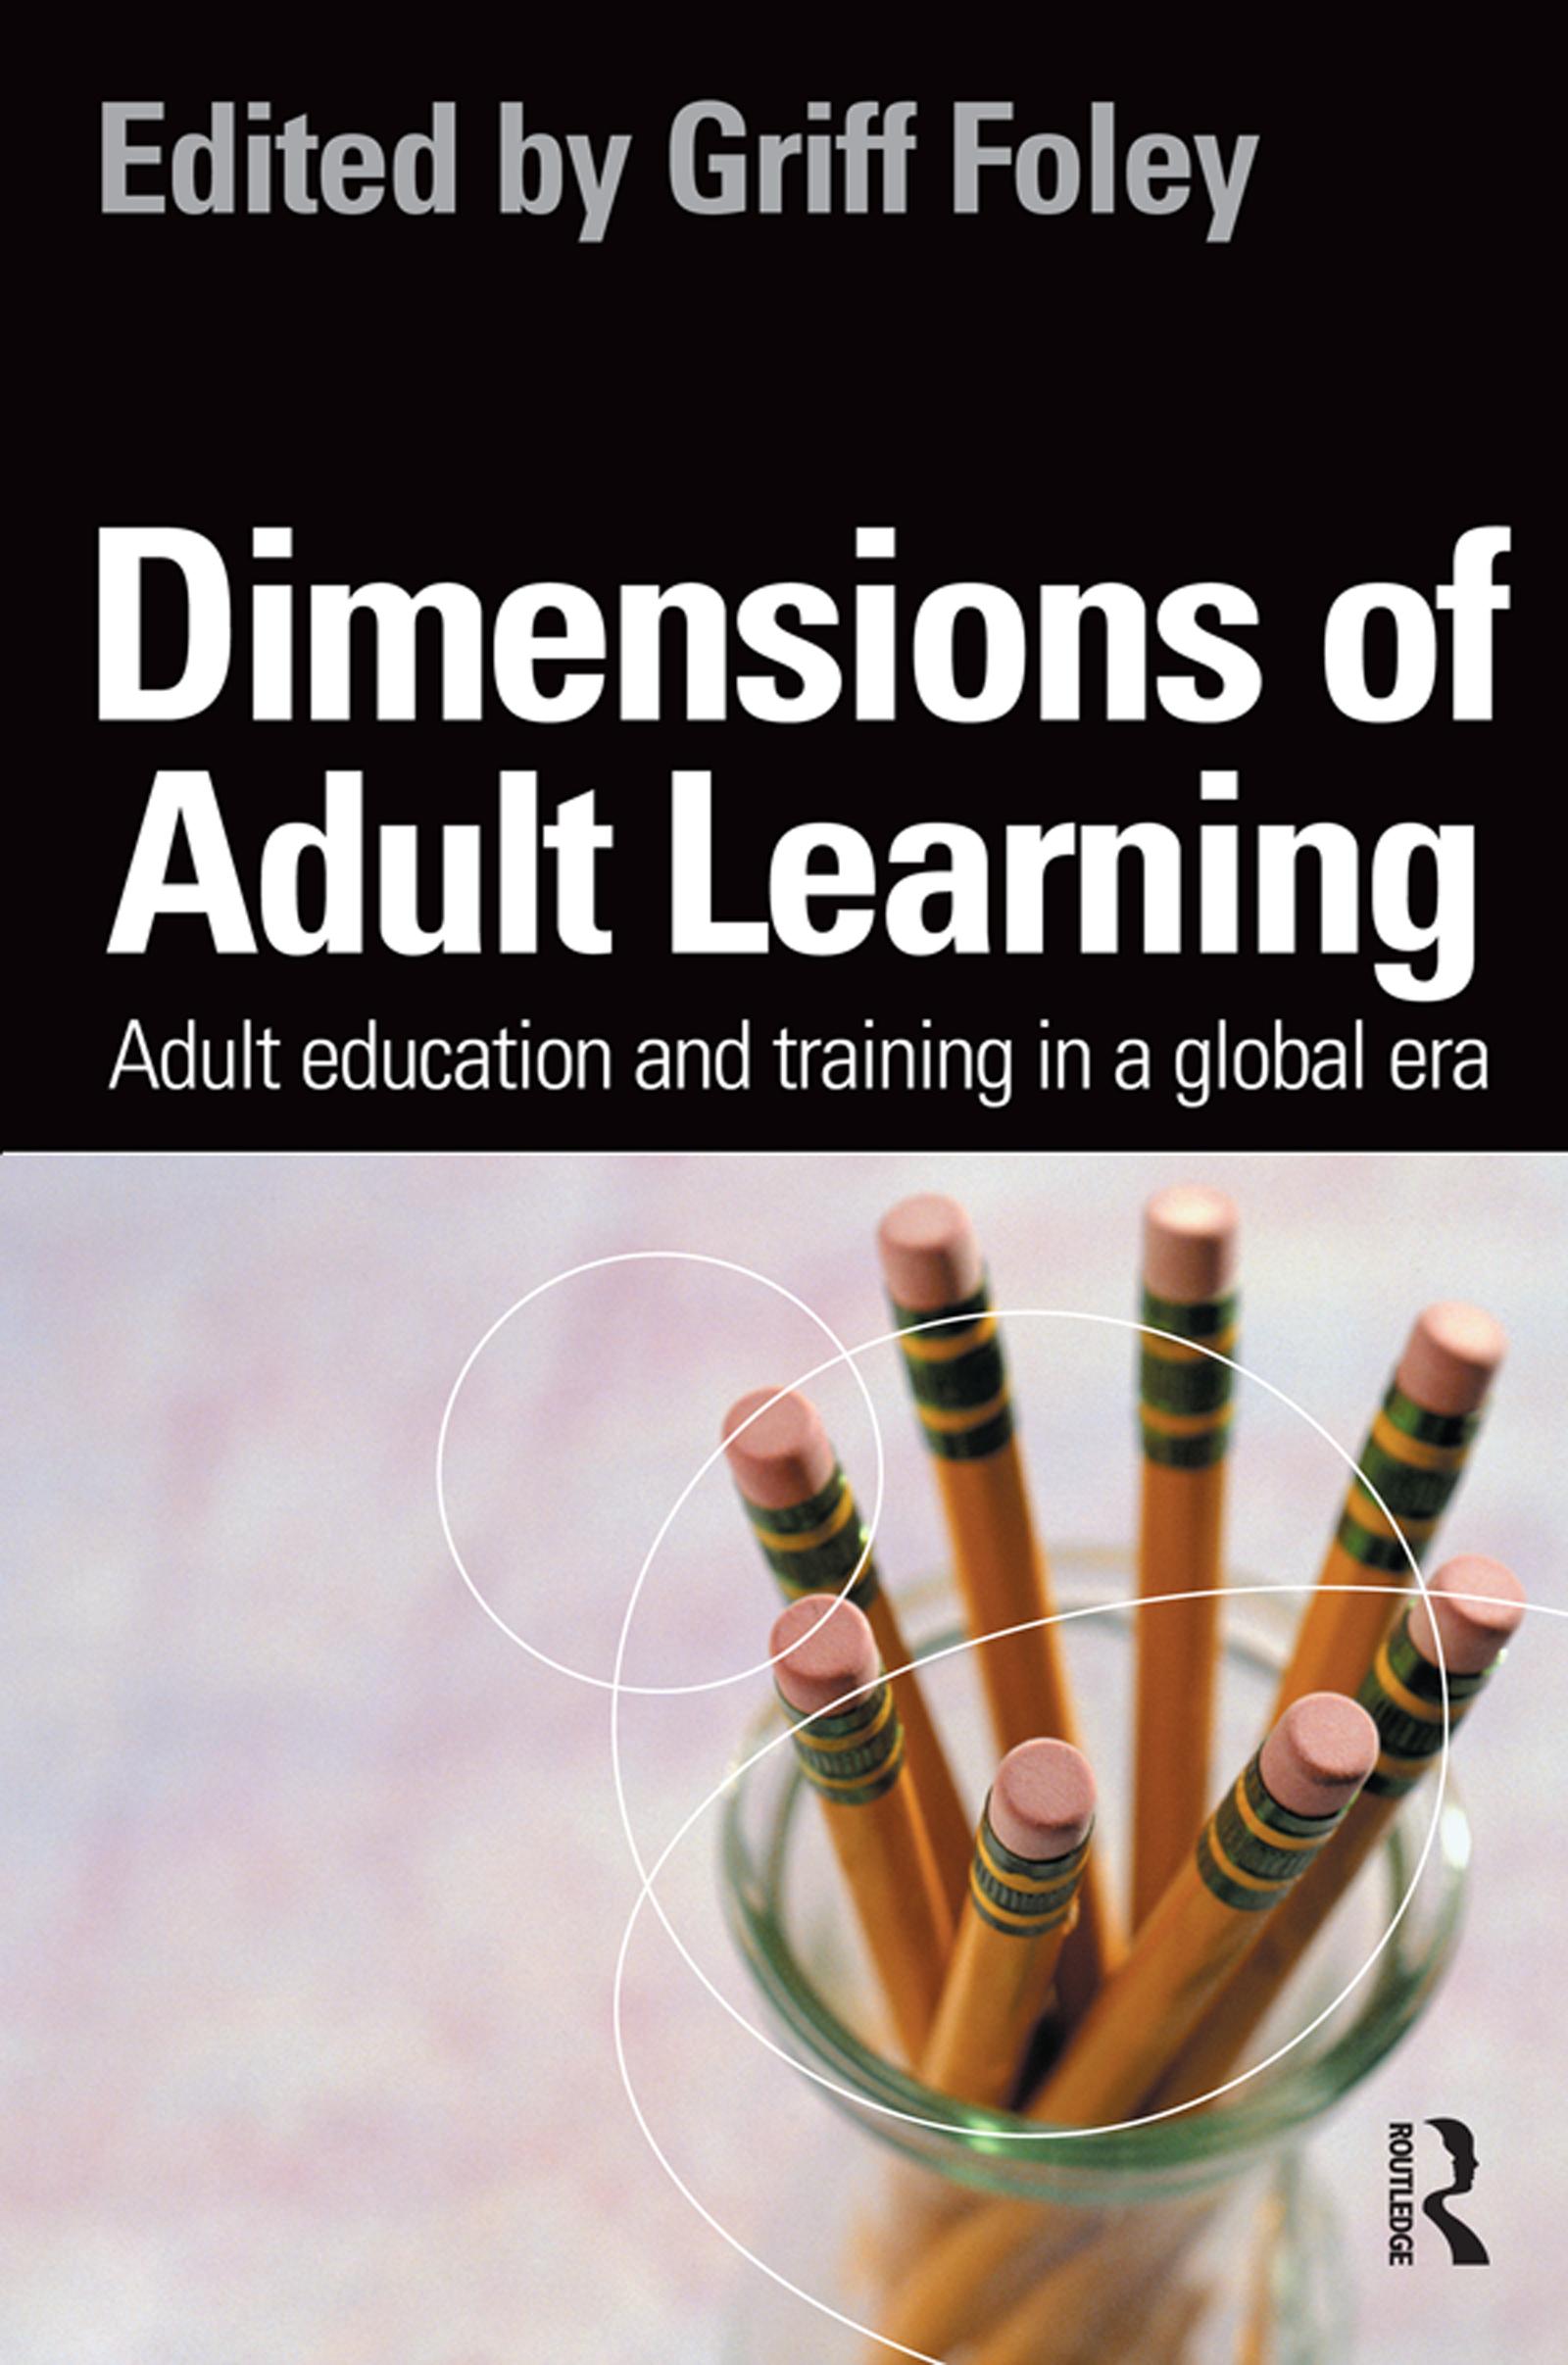 Economics, Politics and Adult Education